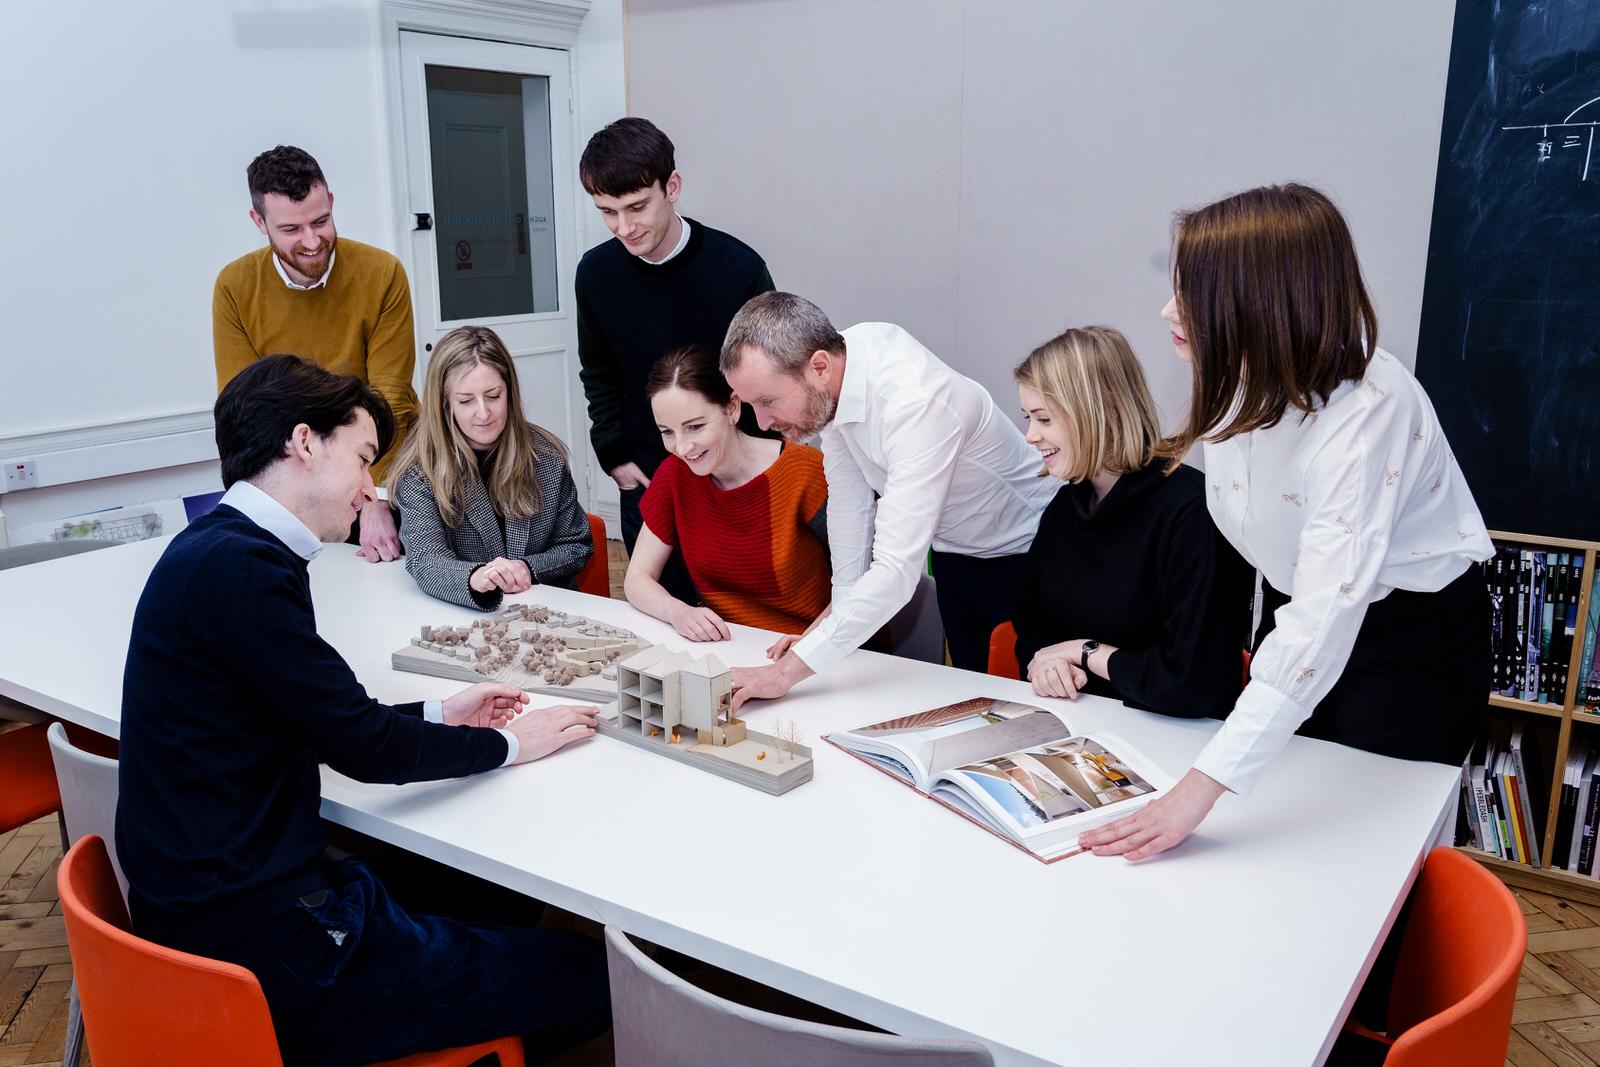 Aughey O' Flaherty Architects. Dublin Ireland.